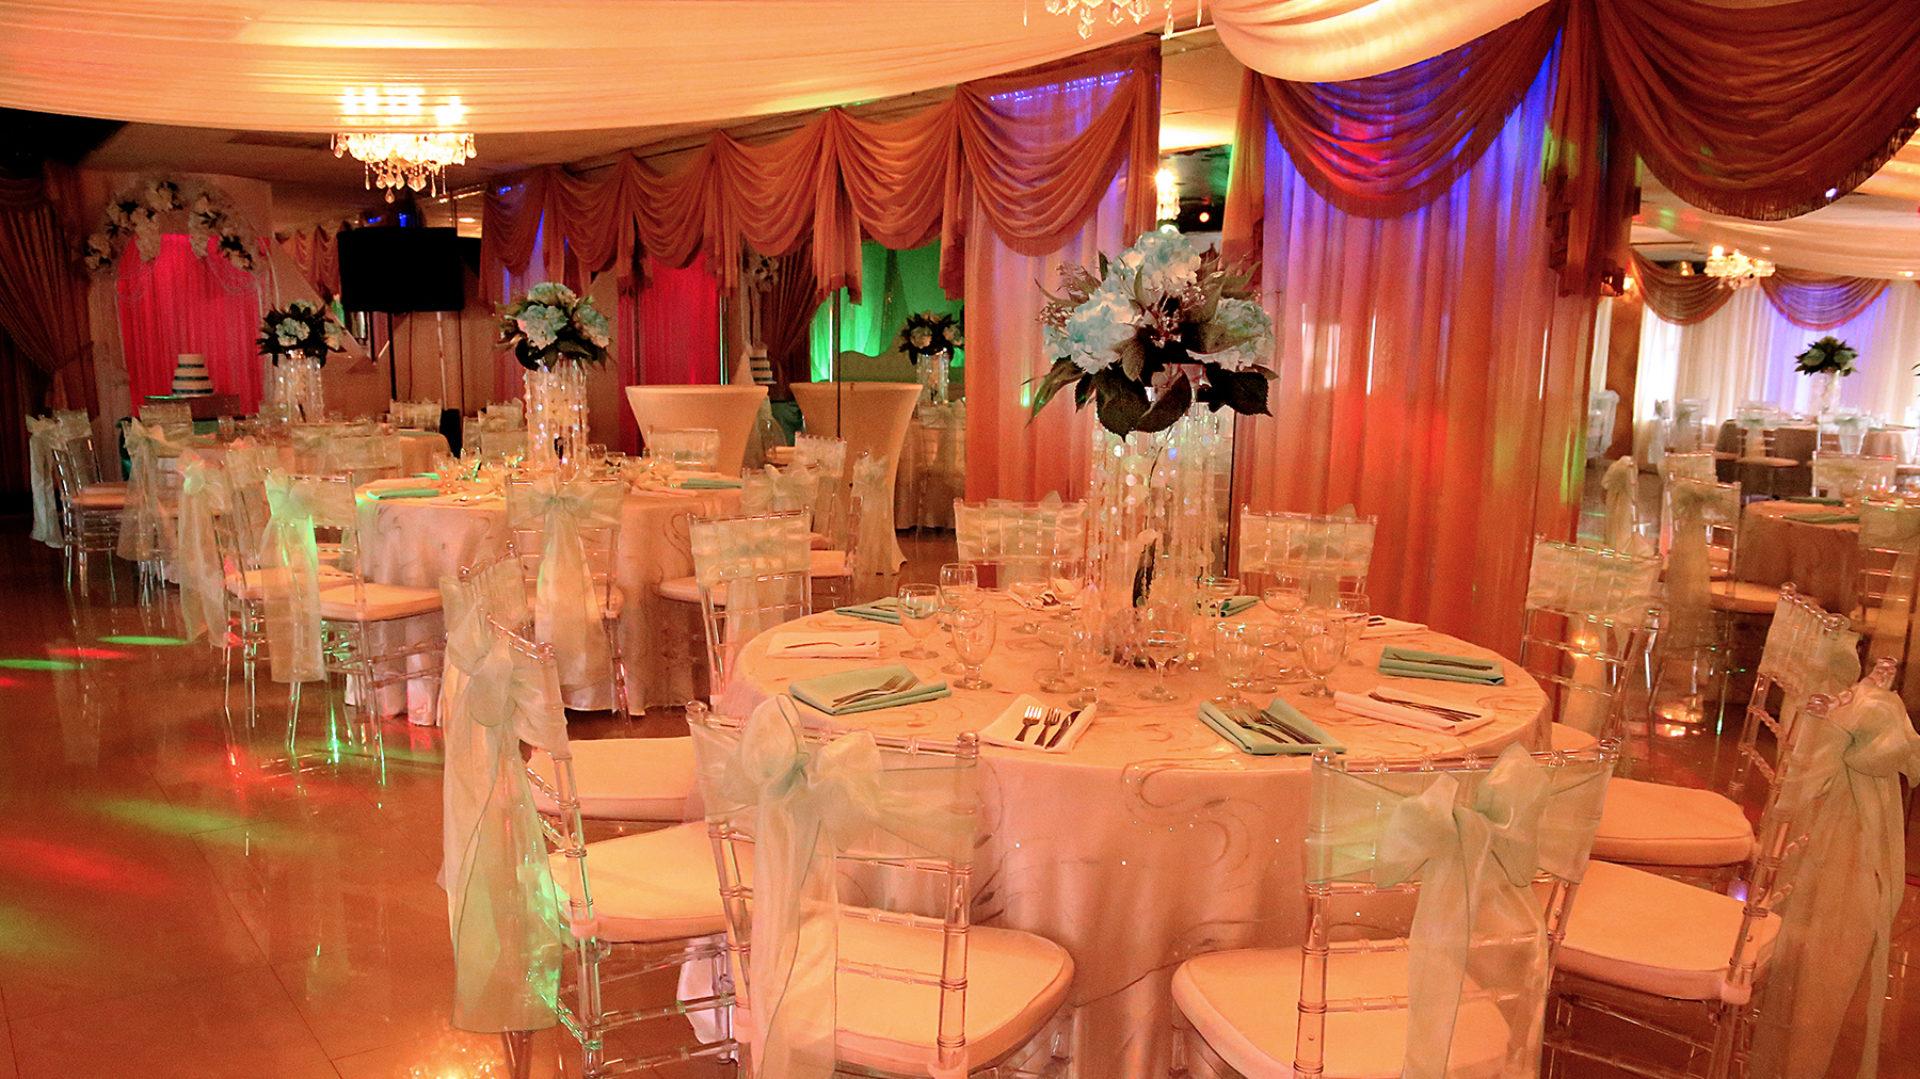 Ensueño Banquet Hall Hialeah | Hialeah Banquet Hall | Wedding Venue Hialeah